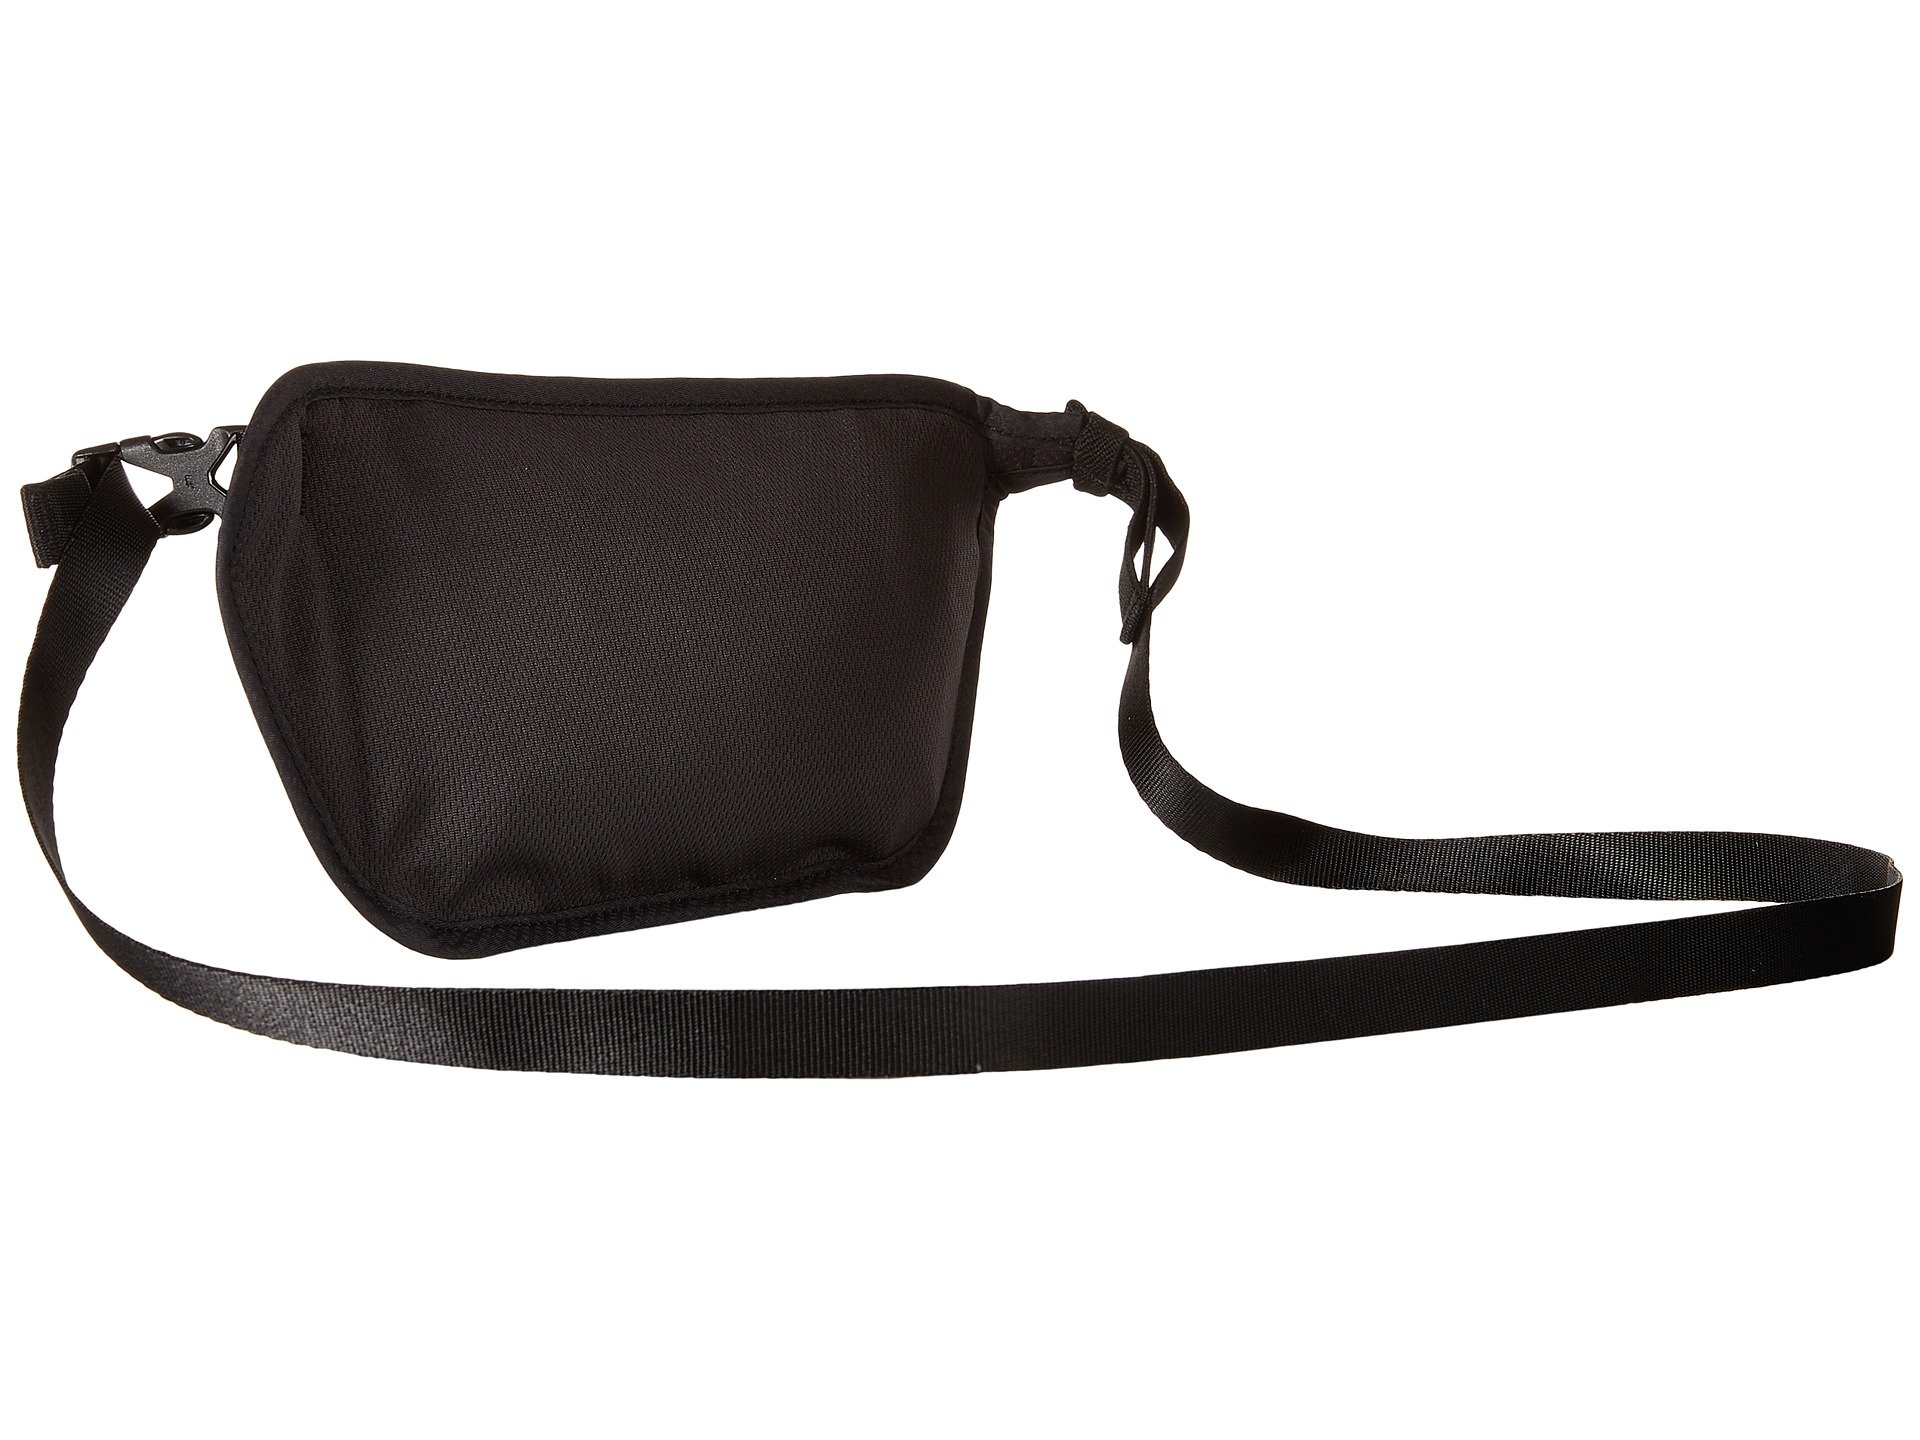 Waist Black Wallet Rfid Pacsafe V100 Coversafe qwBtxfv